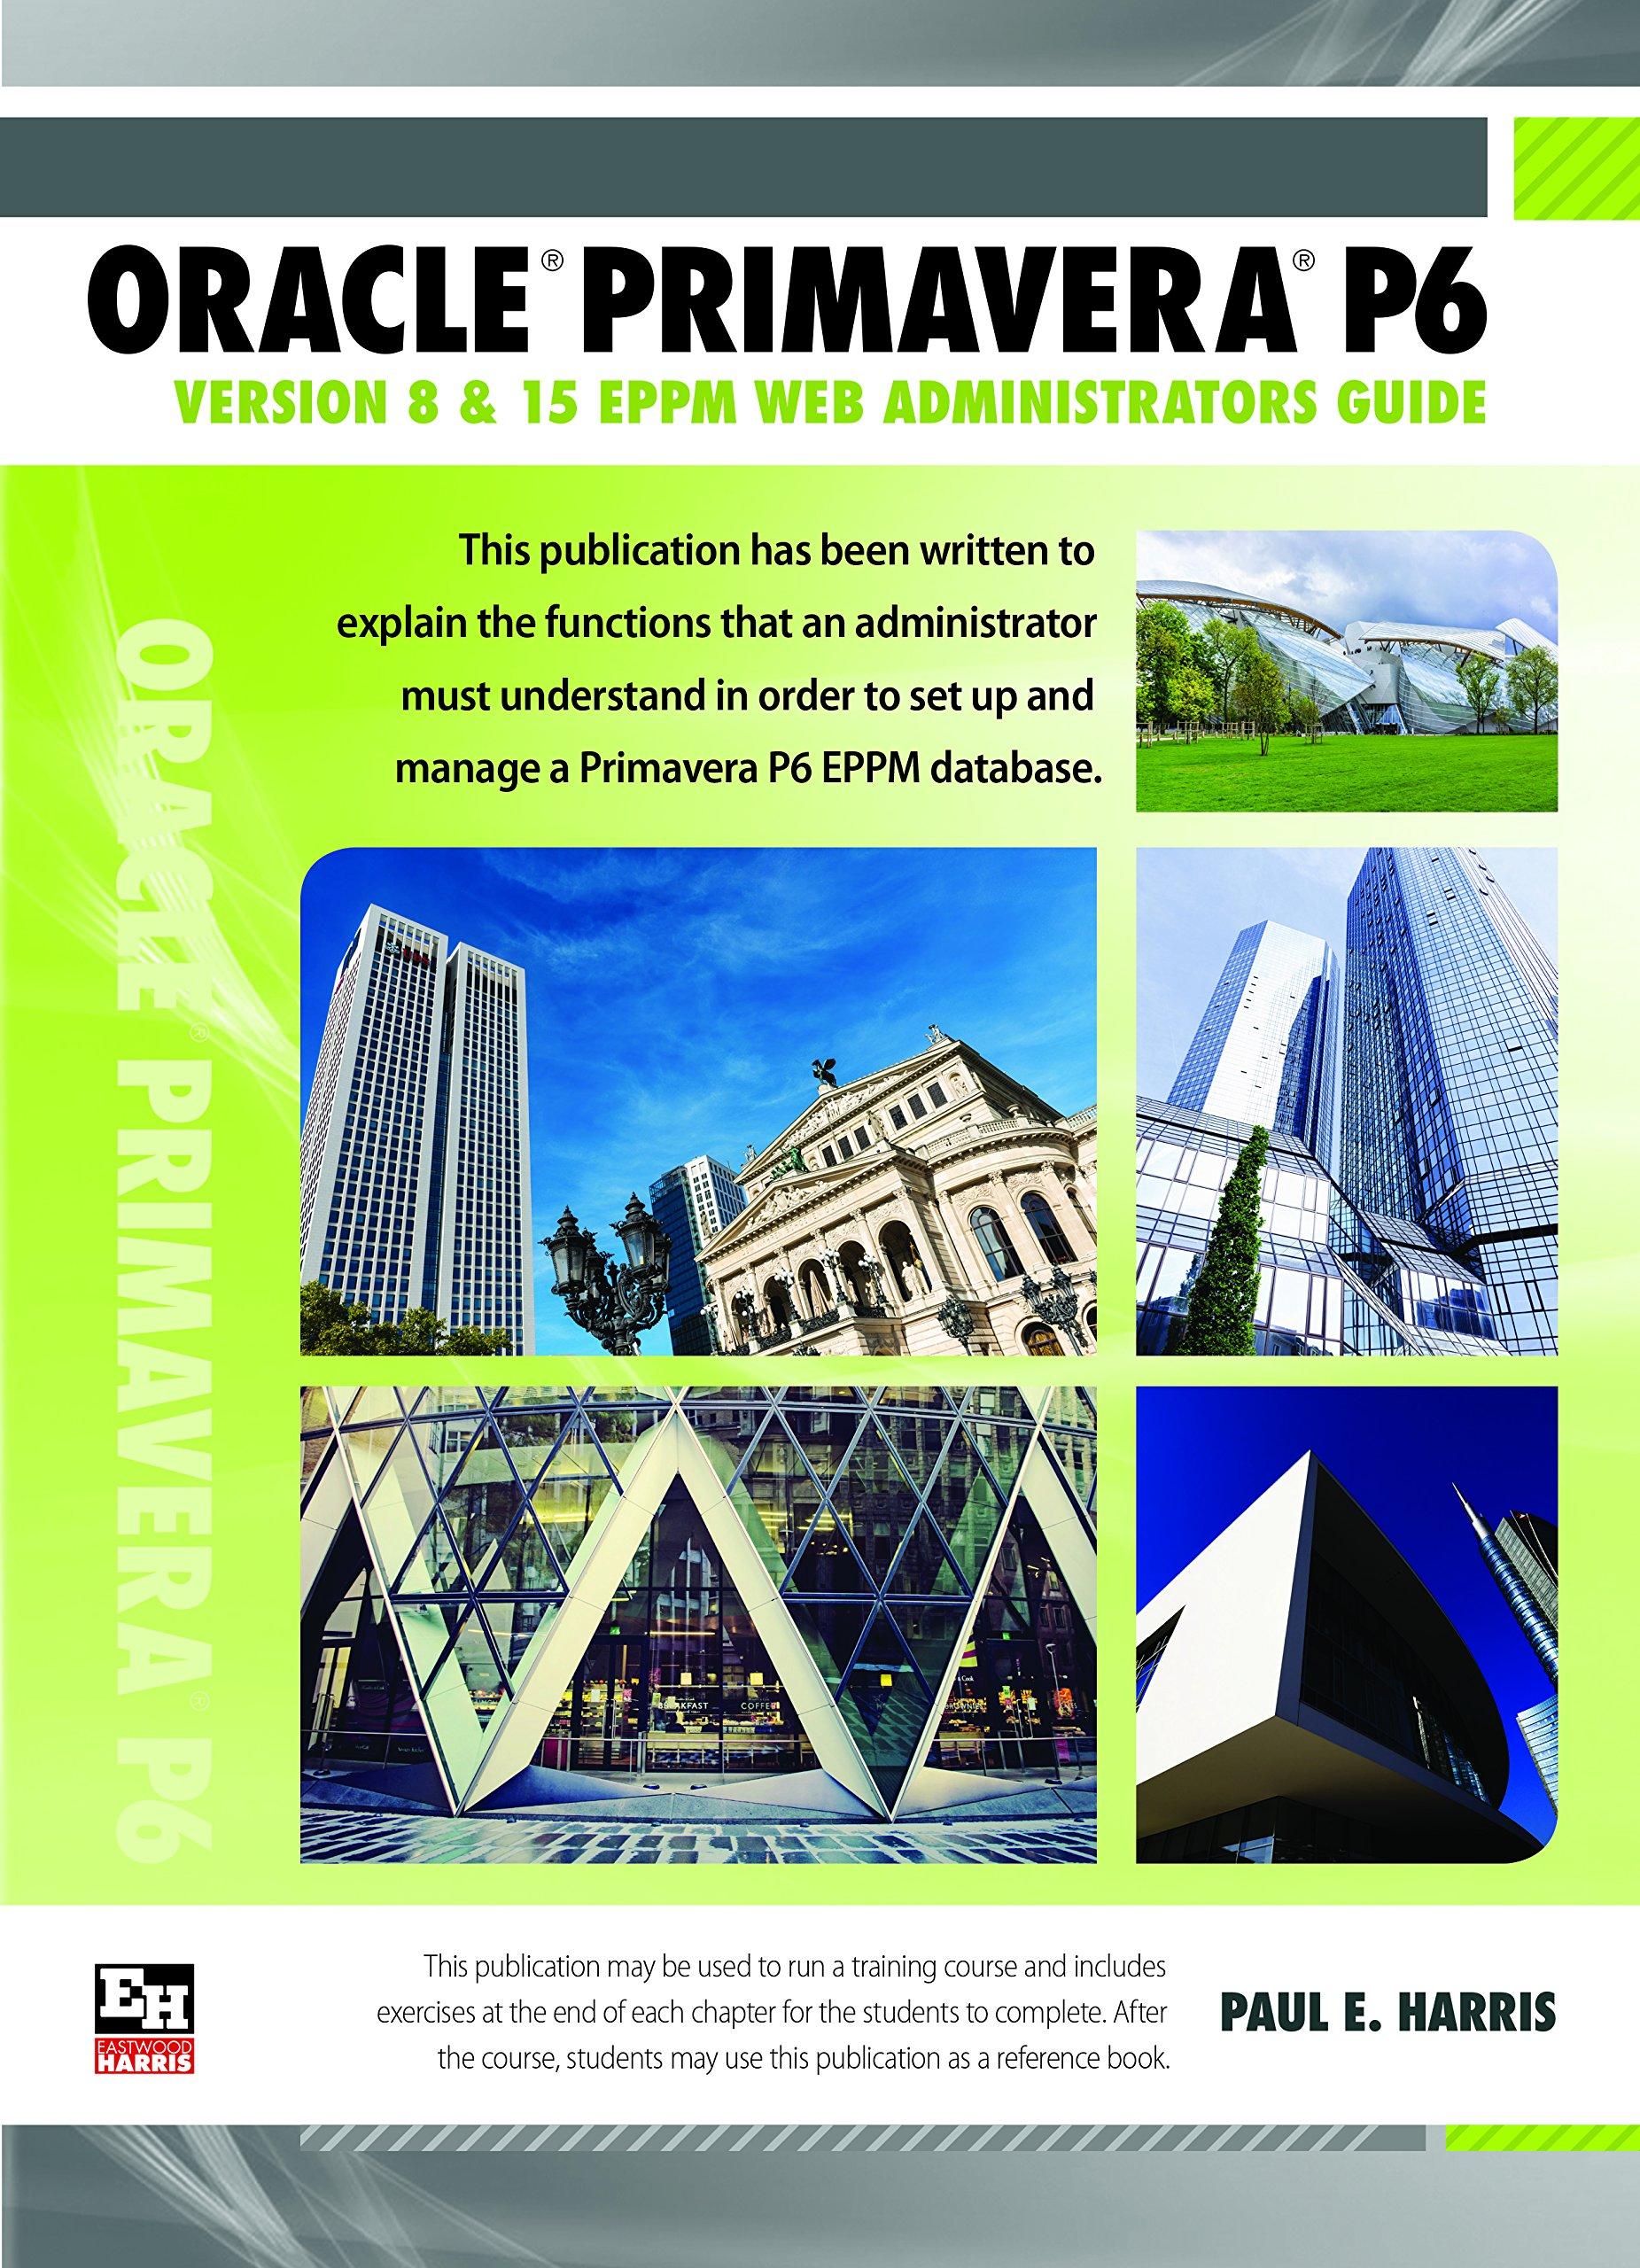 Oracle Primavera P6 Version 8 and 15 EPPM Web Administrators Guide